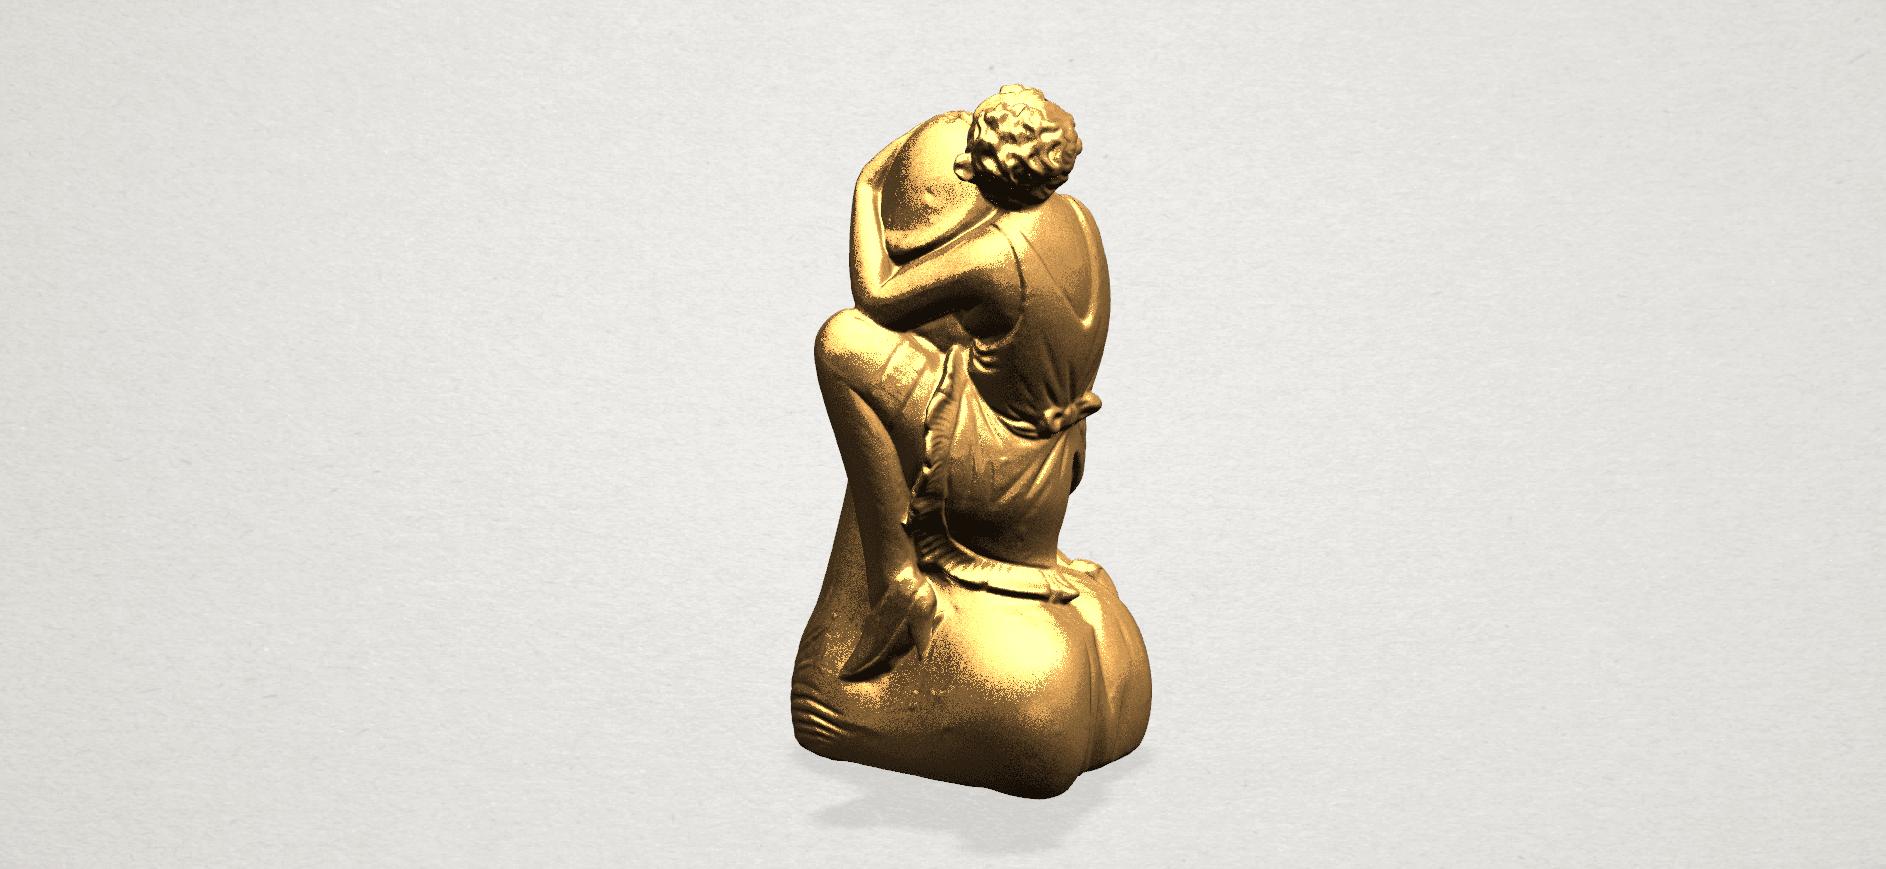 Alice hugging Dick - C02.png Download free STL file Alice hugging Dick • 3D printer design, GeorgesNikkei